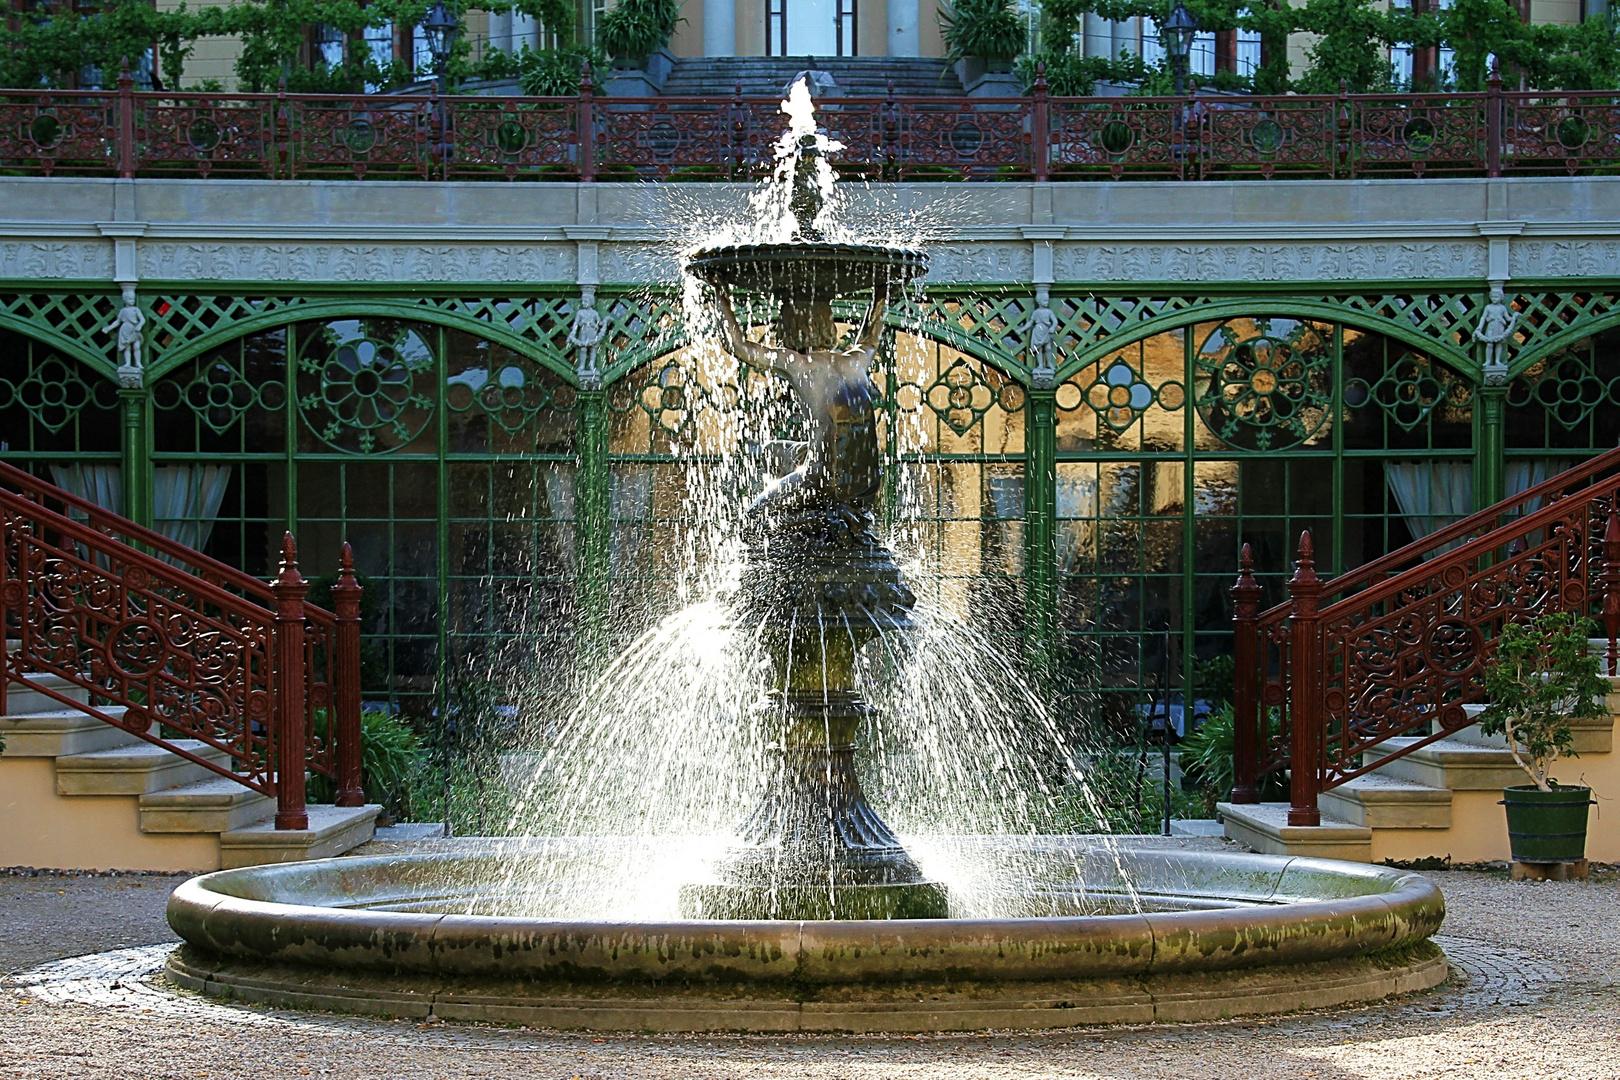 Schwerin ... im Burggarten des Schlosses